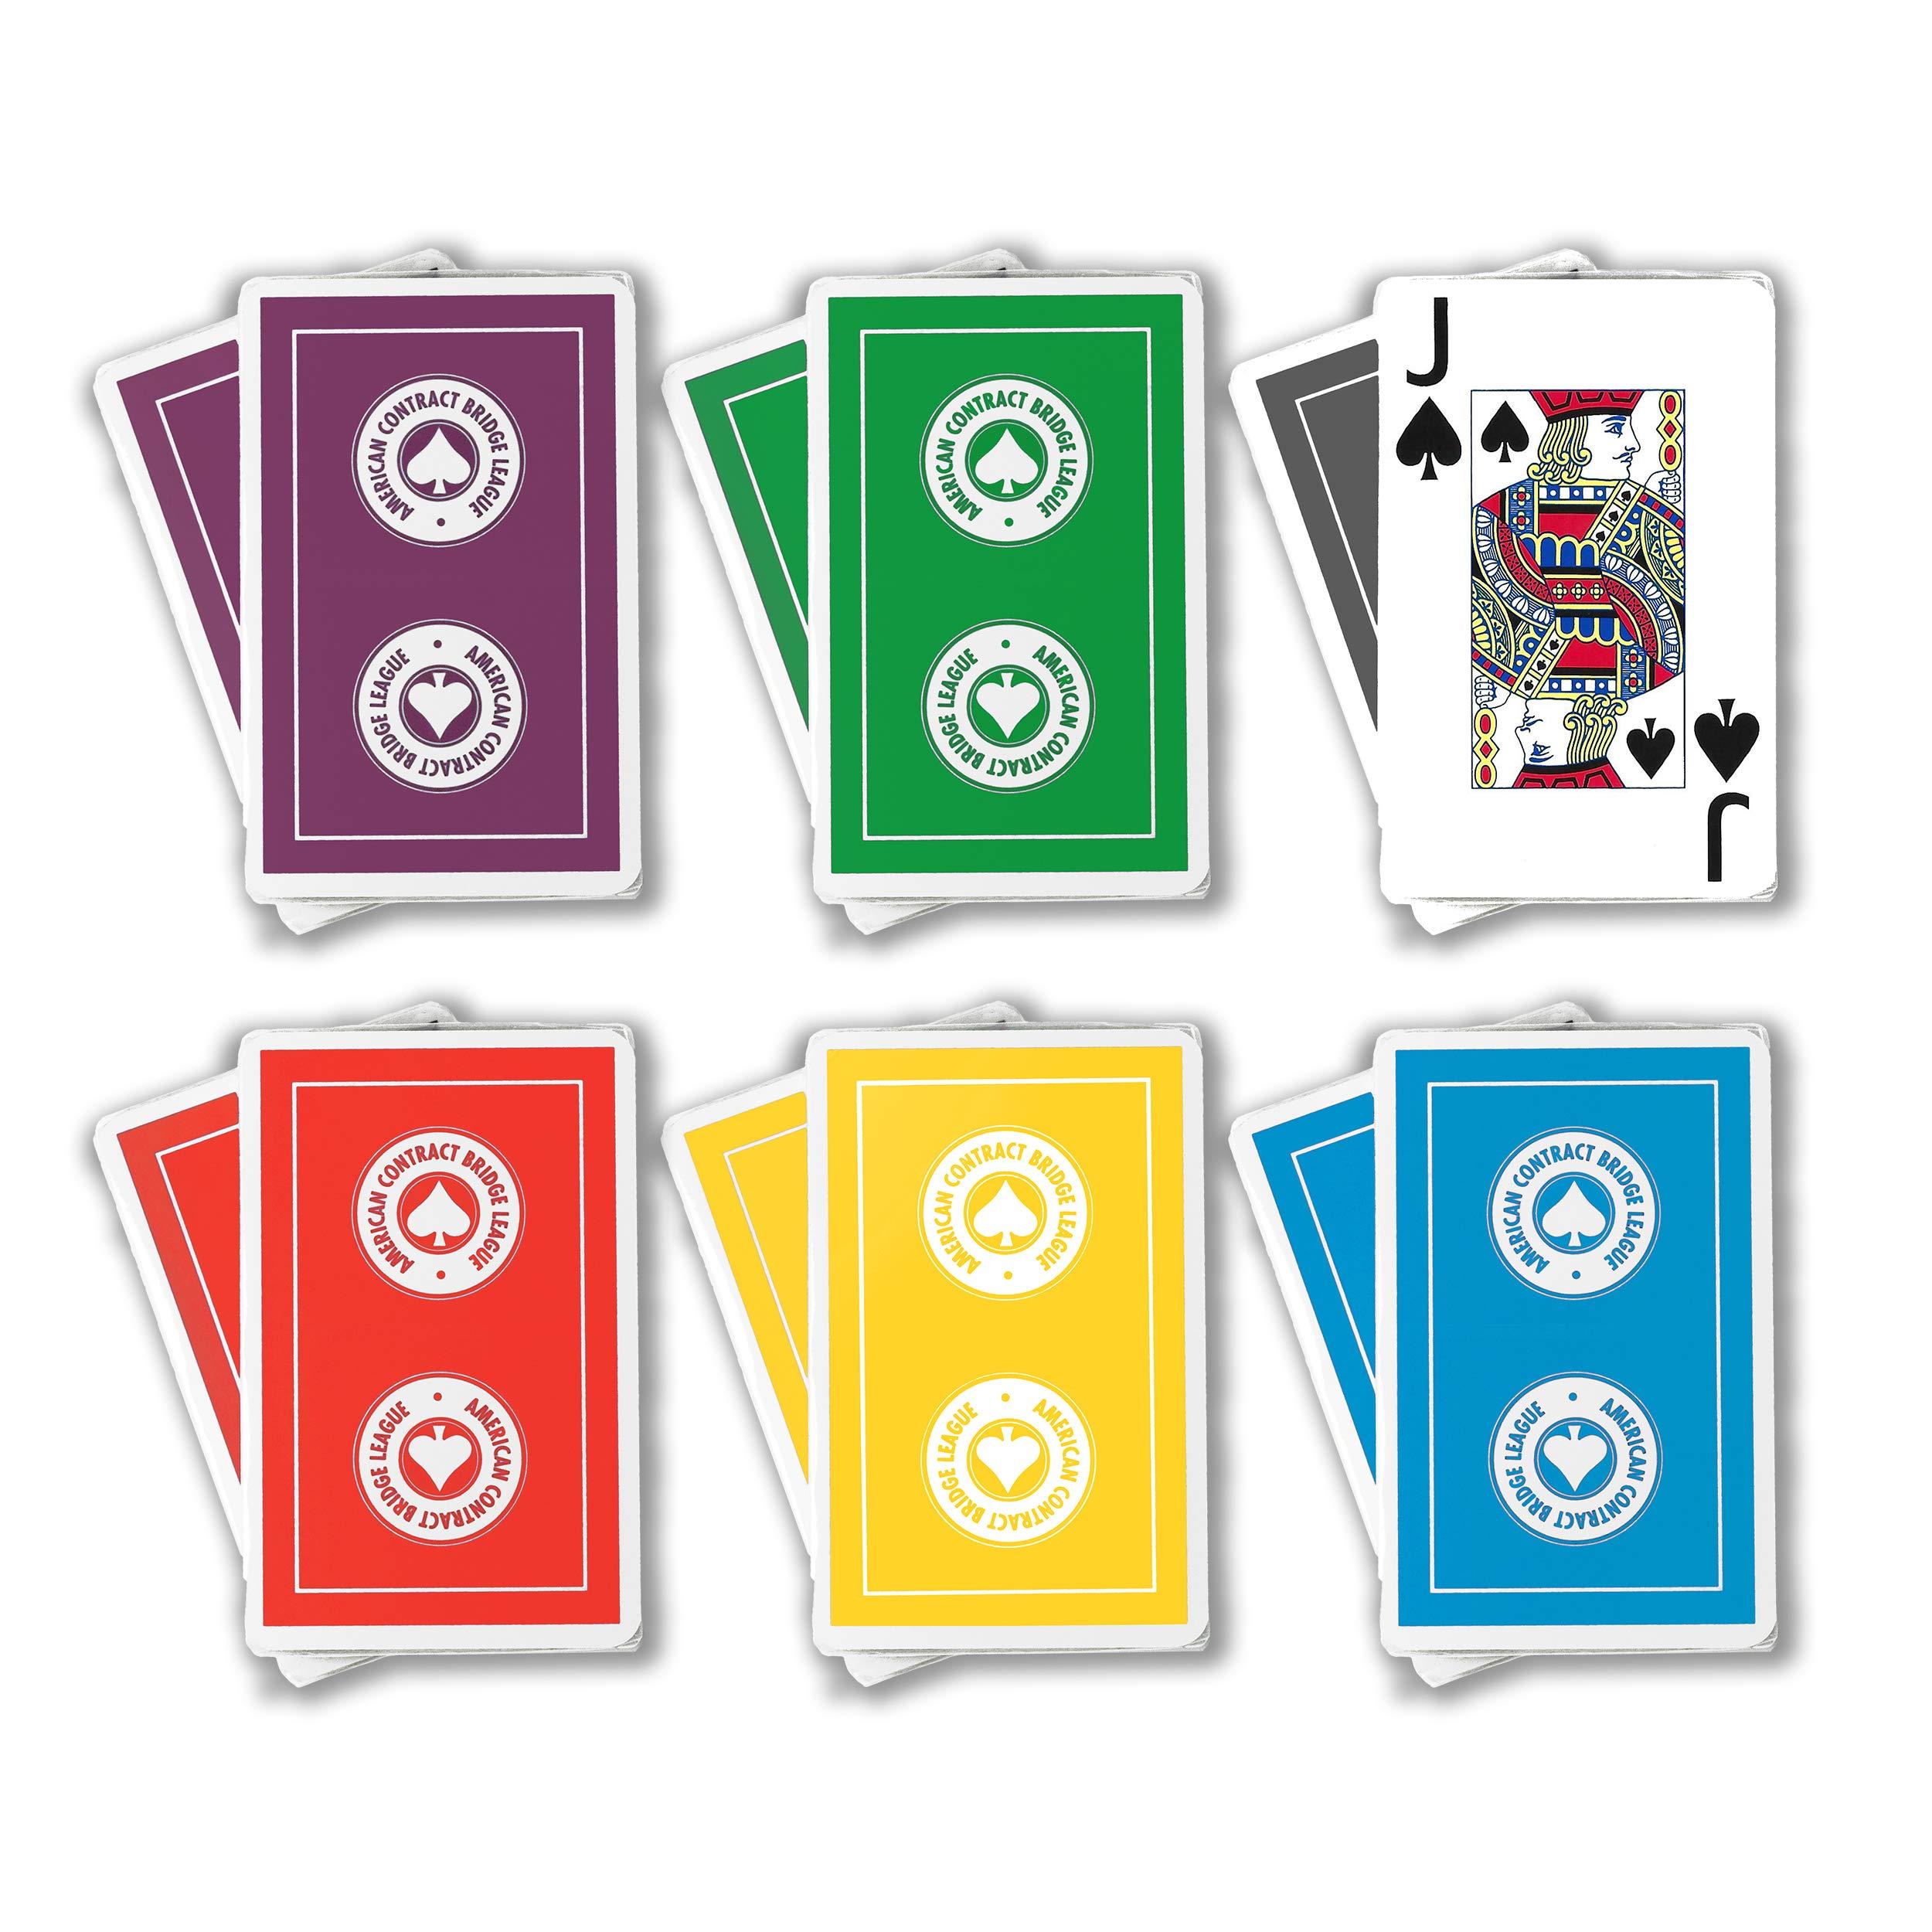 ACBL (American Contract Bridge League) Playing Cards - Jumbo Print - 1 Dozen Decks - Bridge Sized - Plastic Coated by Baron Barclay